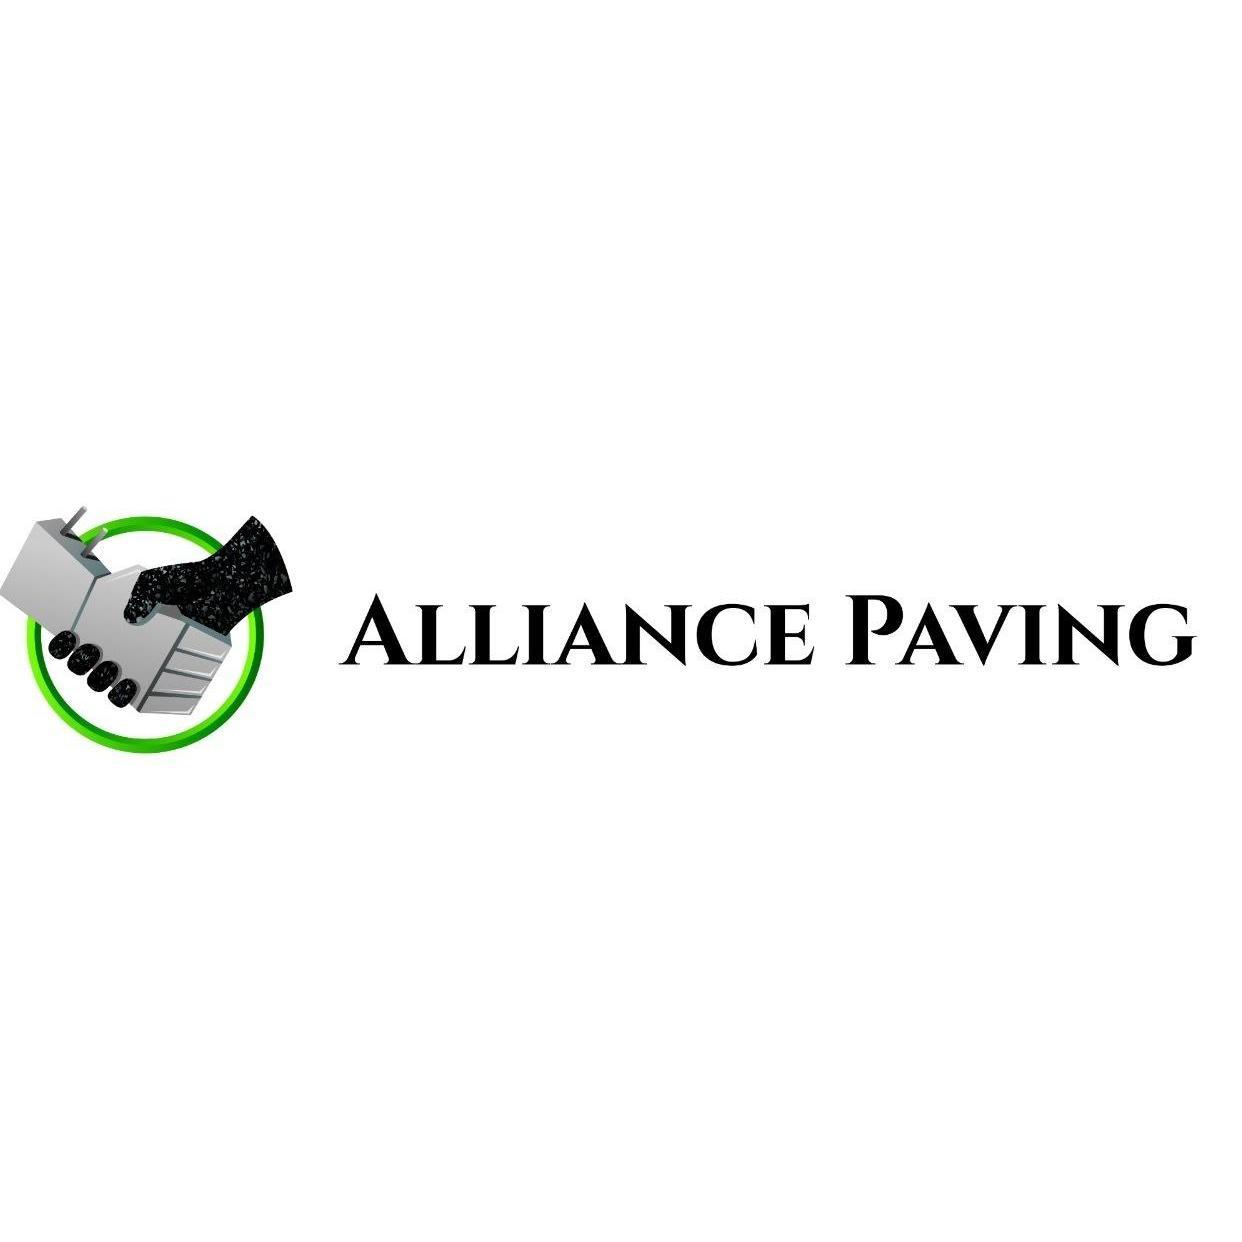 Alliance Paving, Inc.